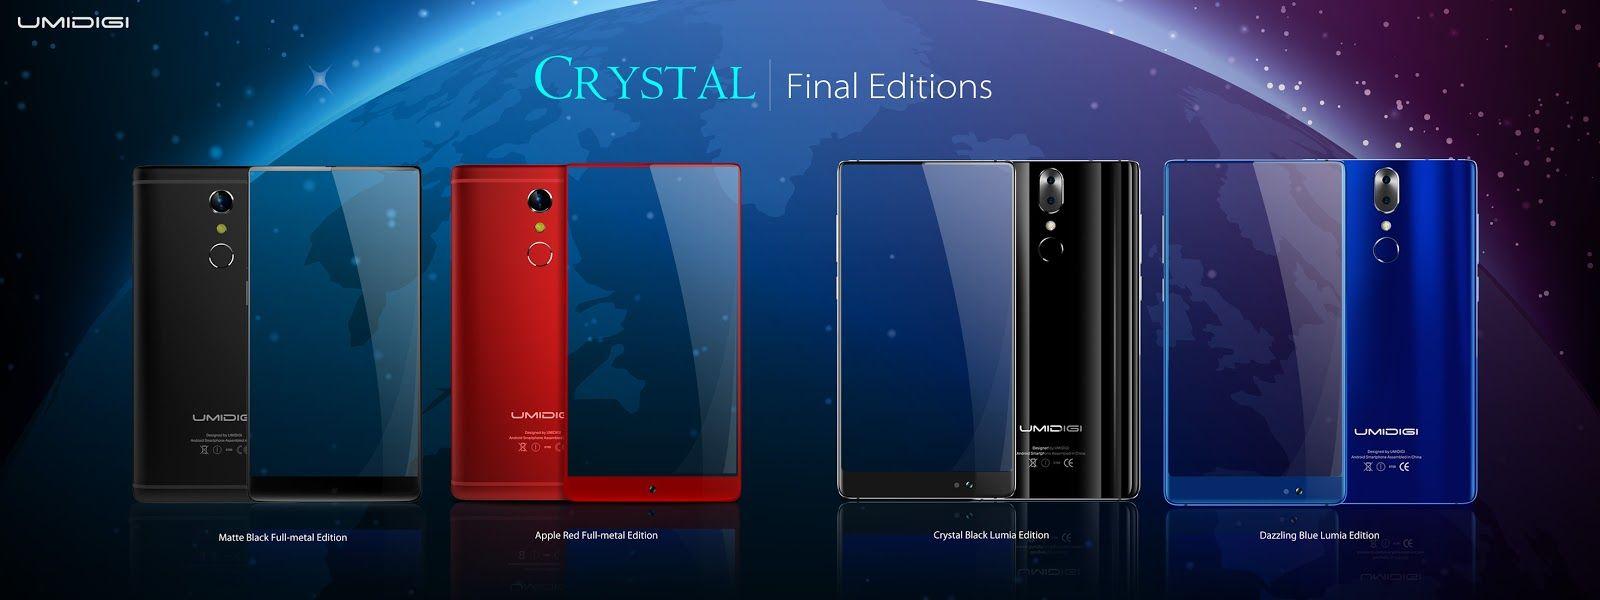 Se desvelan las versiones finales del UMIDIGI Crystal , ¿quieres uno gratis ? ¡Apuntate! alh6_googleusercontent_com_nzsravol0fqmdsfzsvcayt5wex_rq2wkthg4e55da02fffb680e7363f88dd6a3abe4-jpg.288459